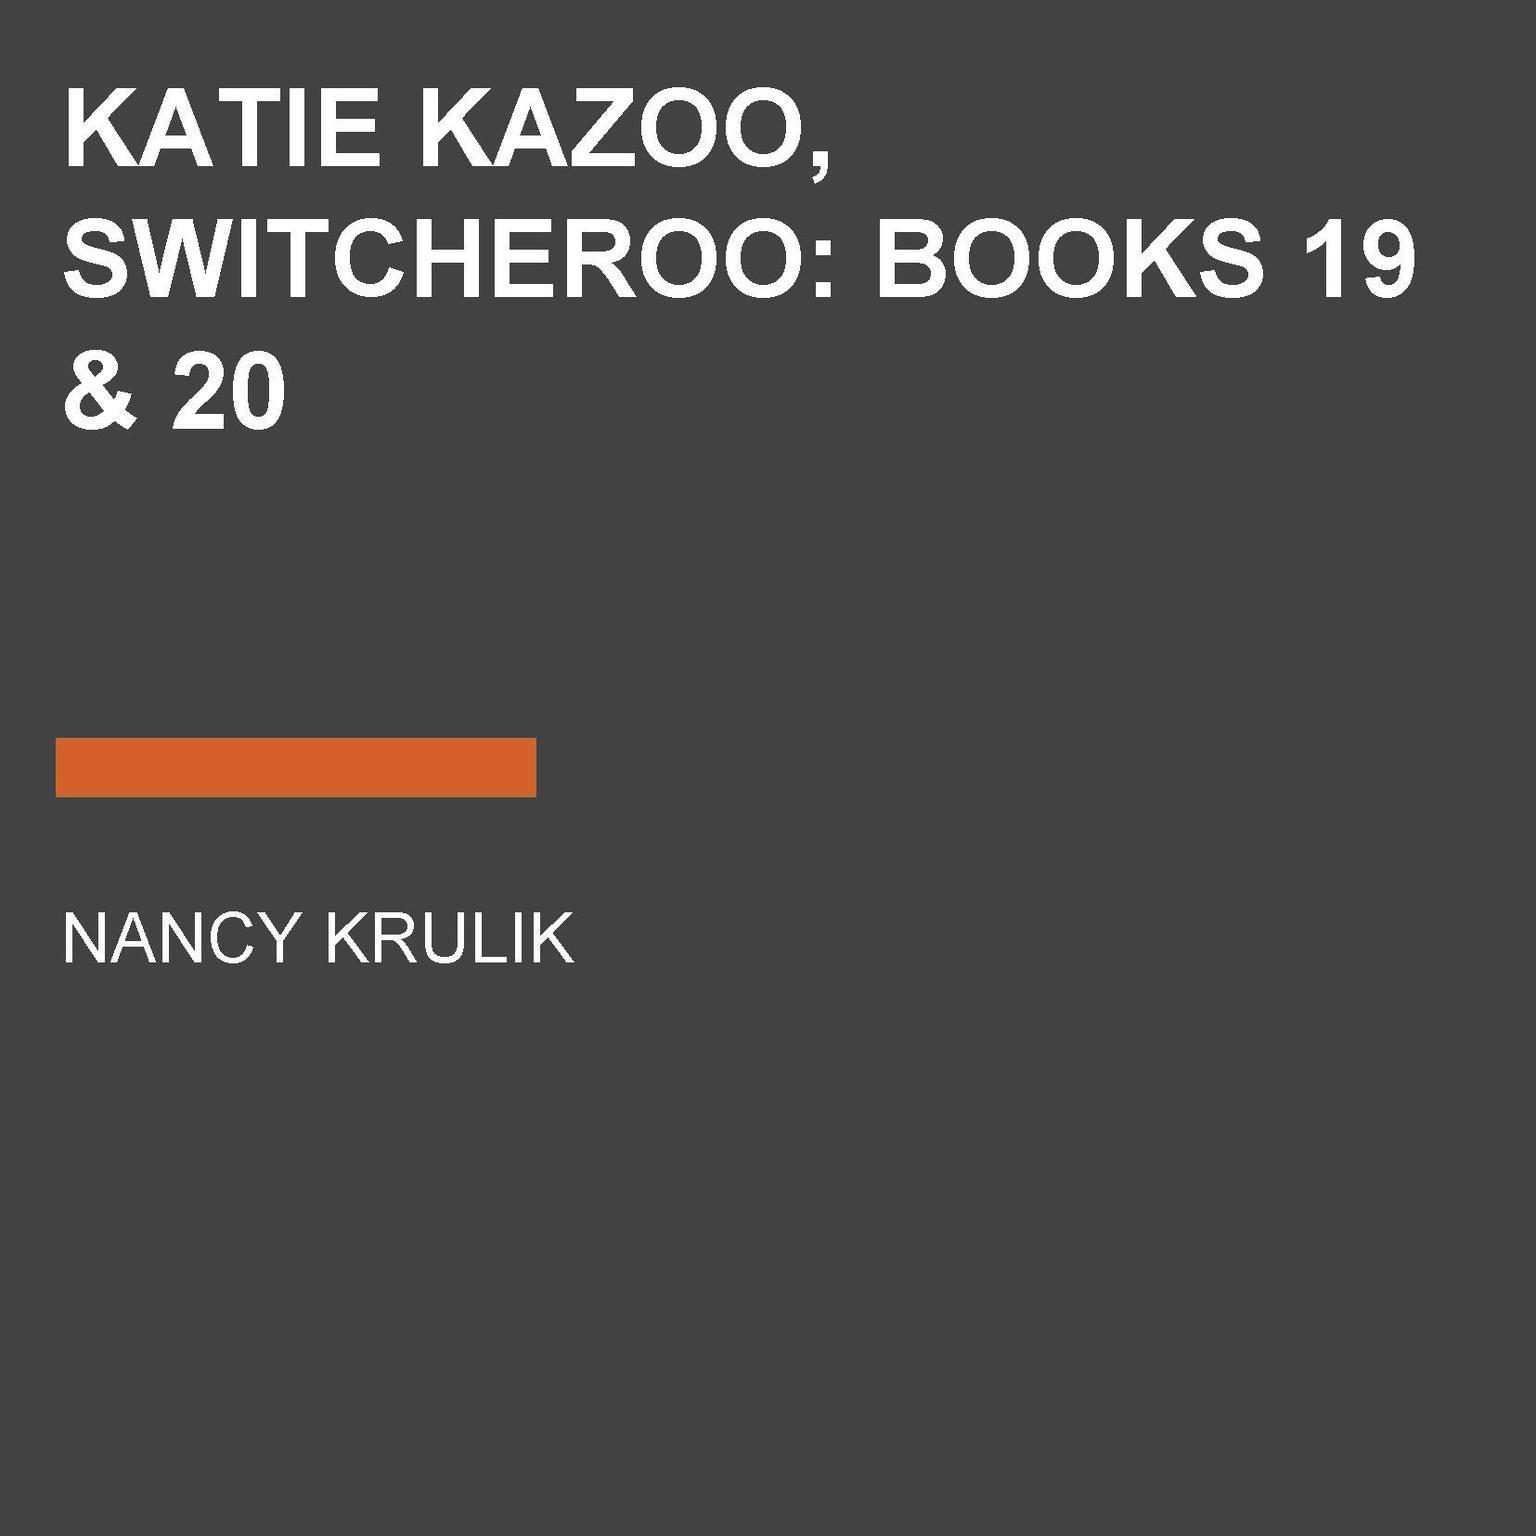 Katie Kazoo, Switcheroo: Books 19 & 20 Audiobook, by Nancy Krulik